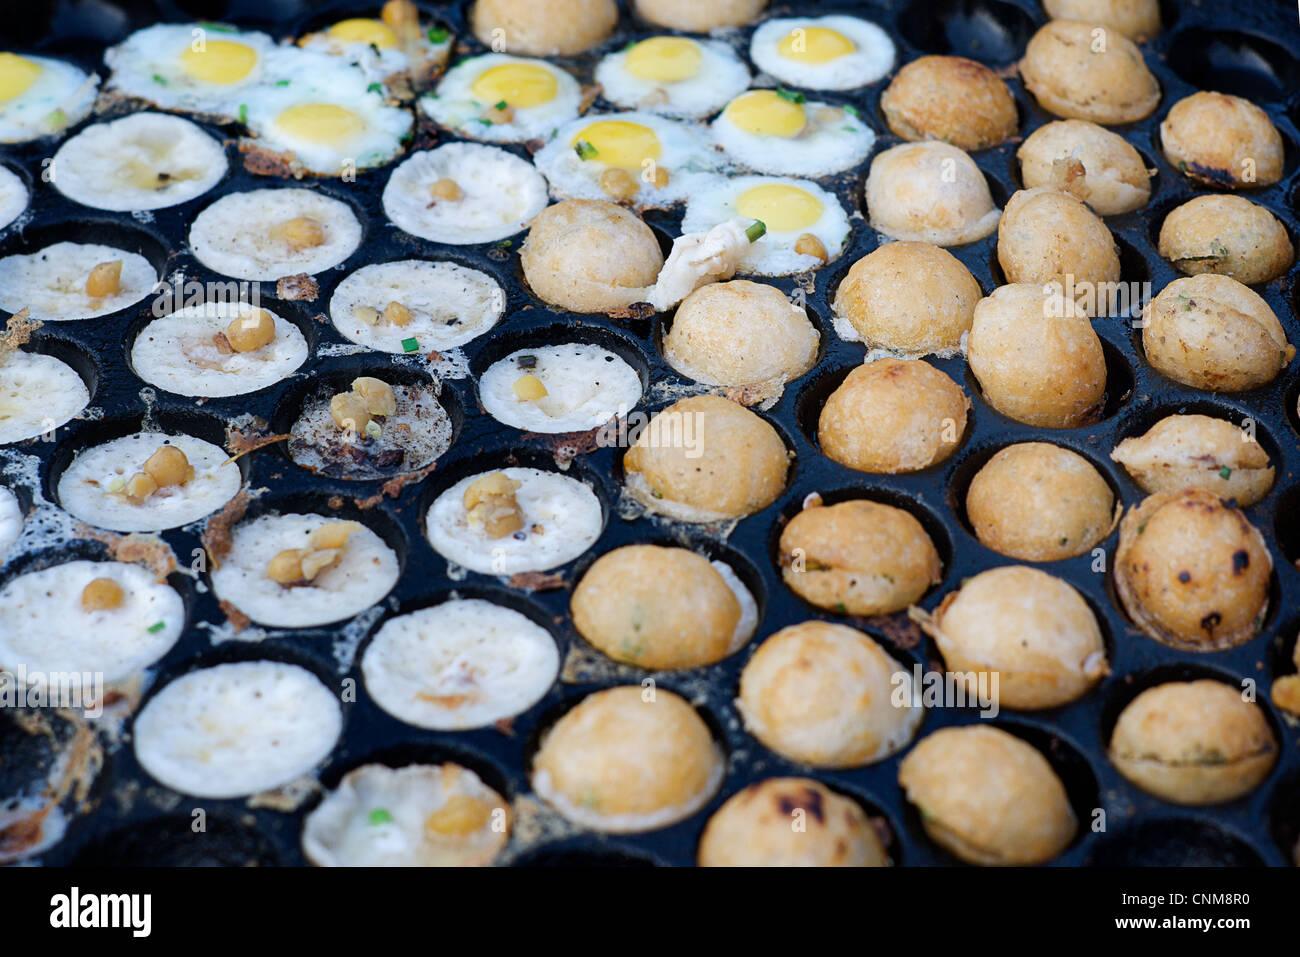 Japanese-like takoyaki. Fried balls with egg. Pyin U Lwin market, Shan State, Burma. Myanmar - Stock Image